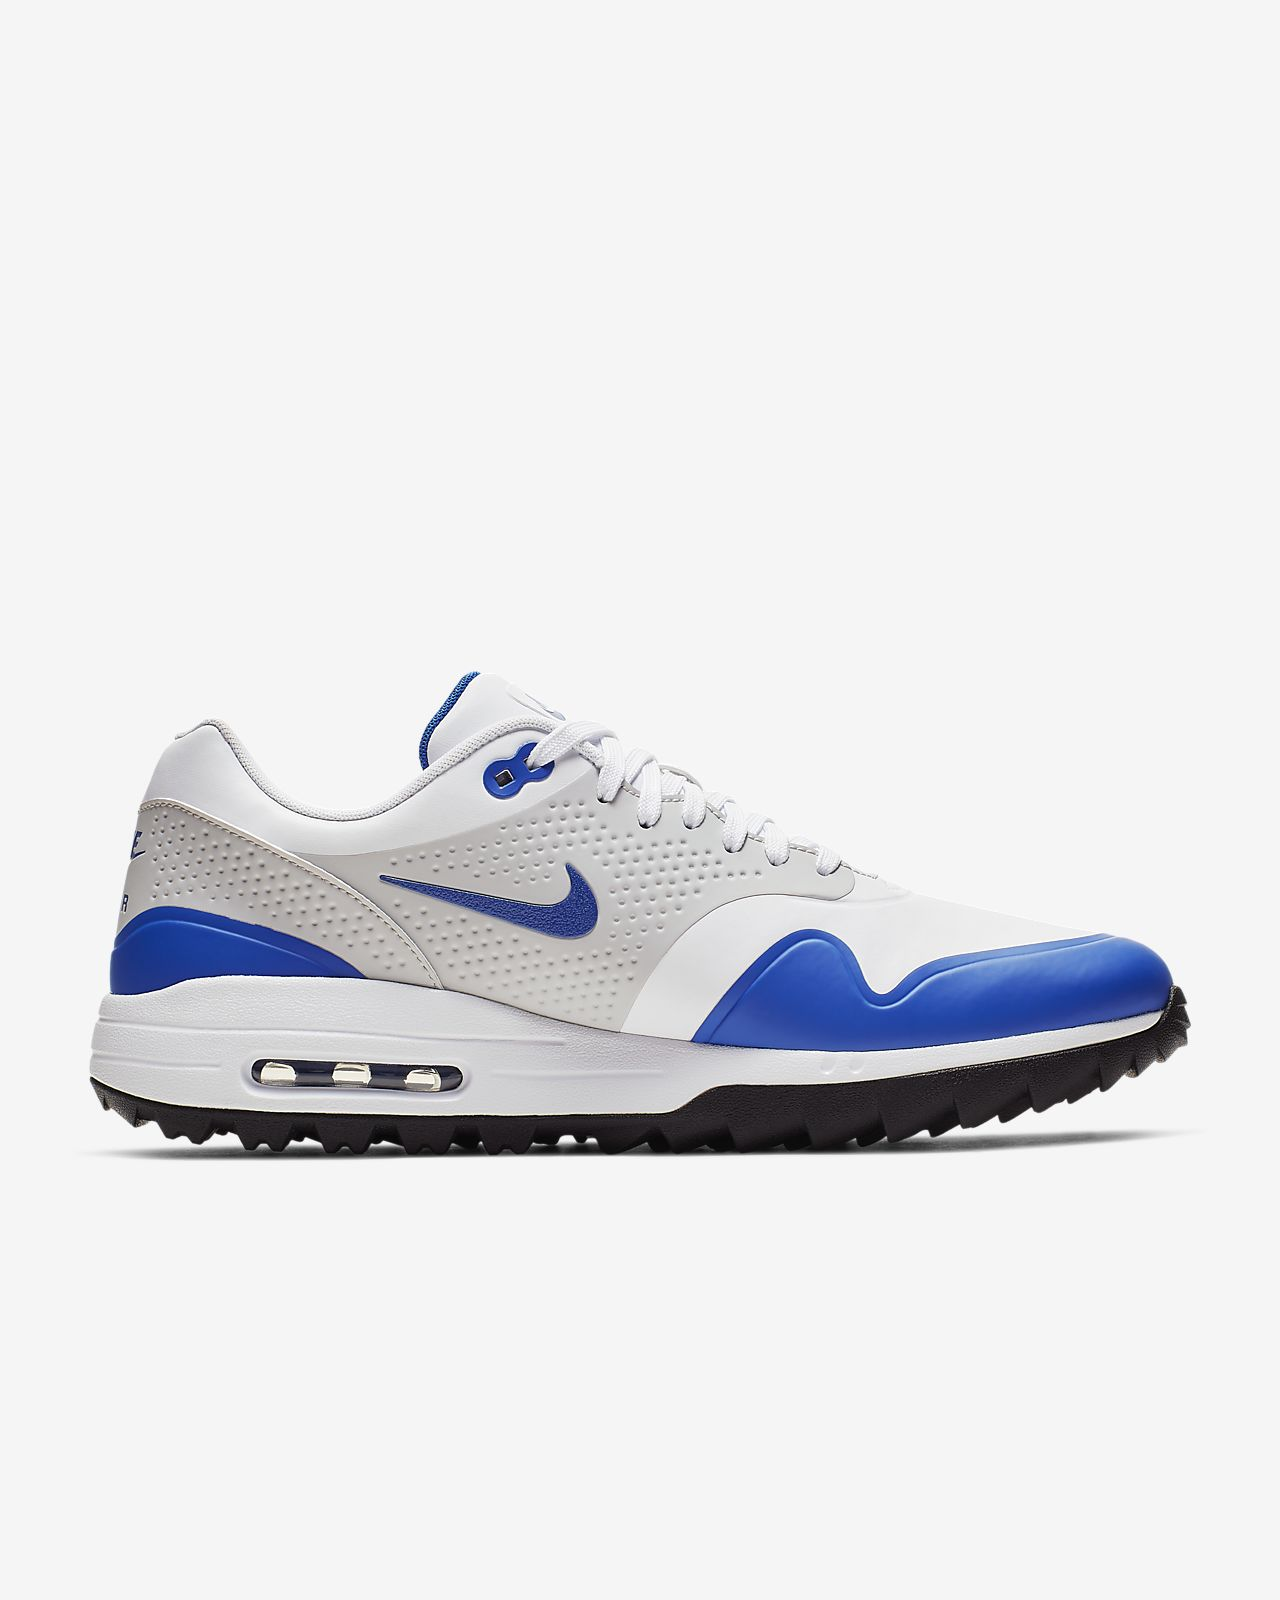 Nike Air Max 1 Trainers. GB